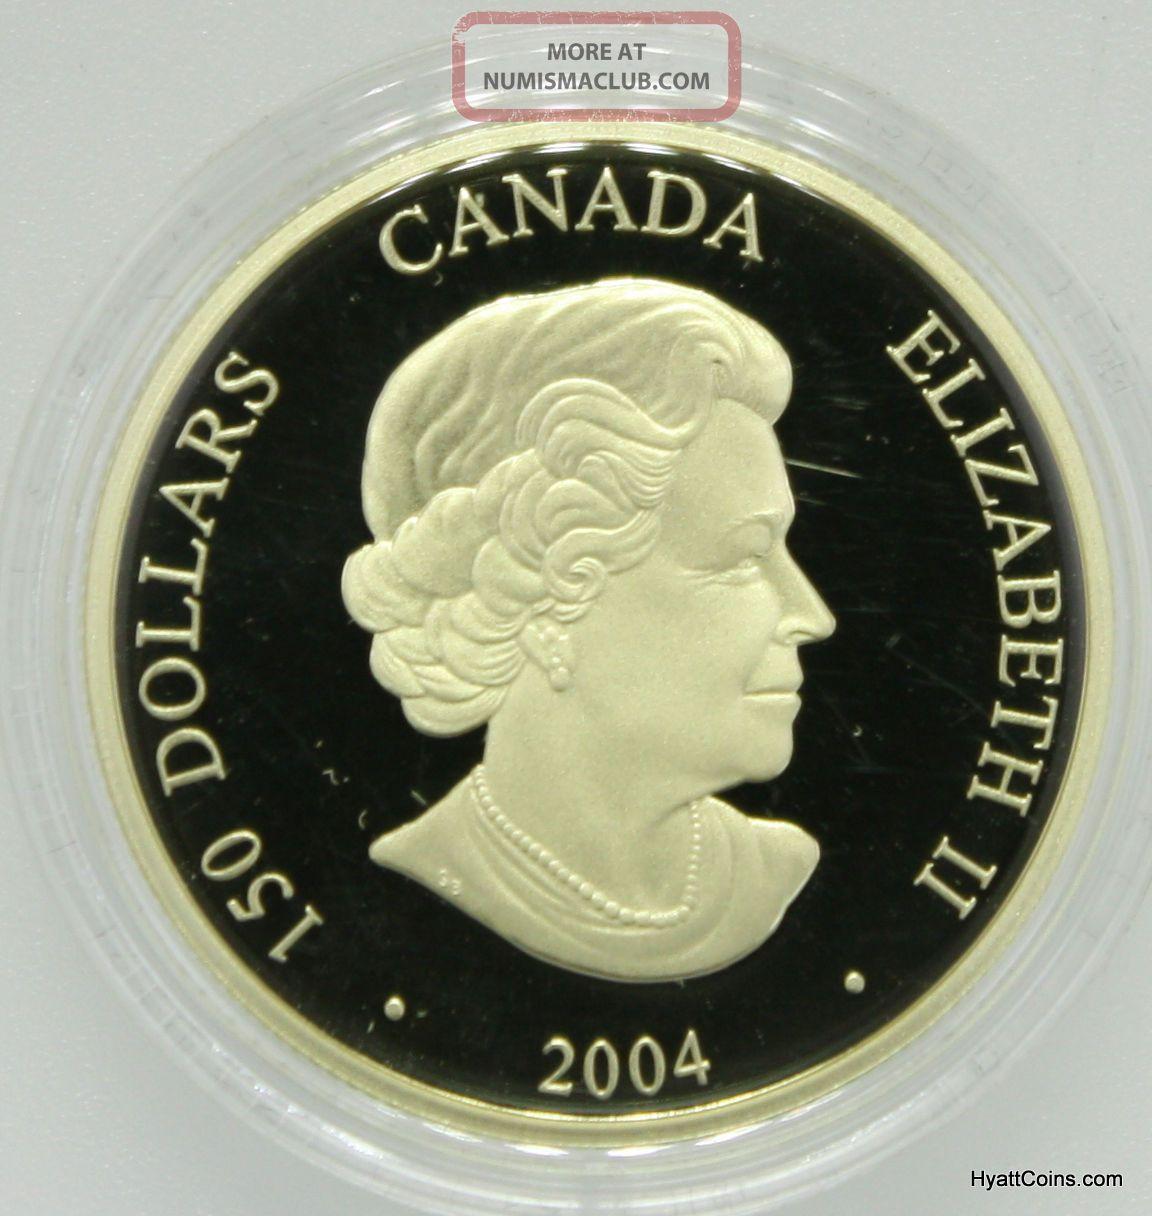 Canada monkey gold coin price : Kin coin offline wallet example